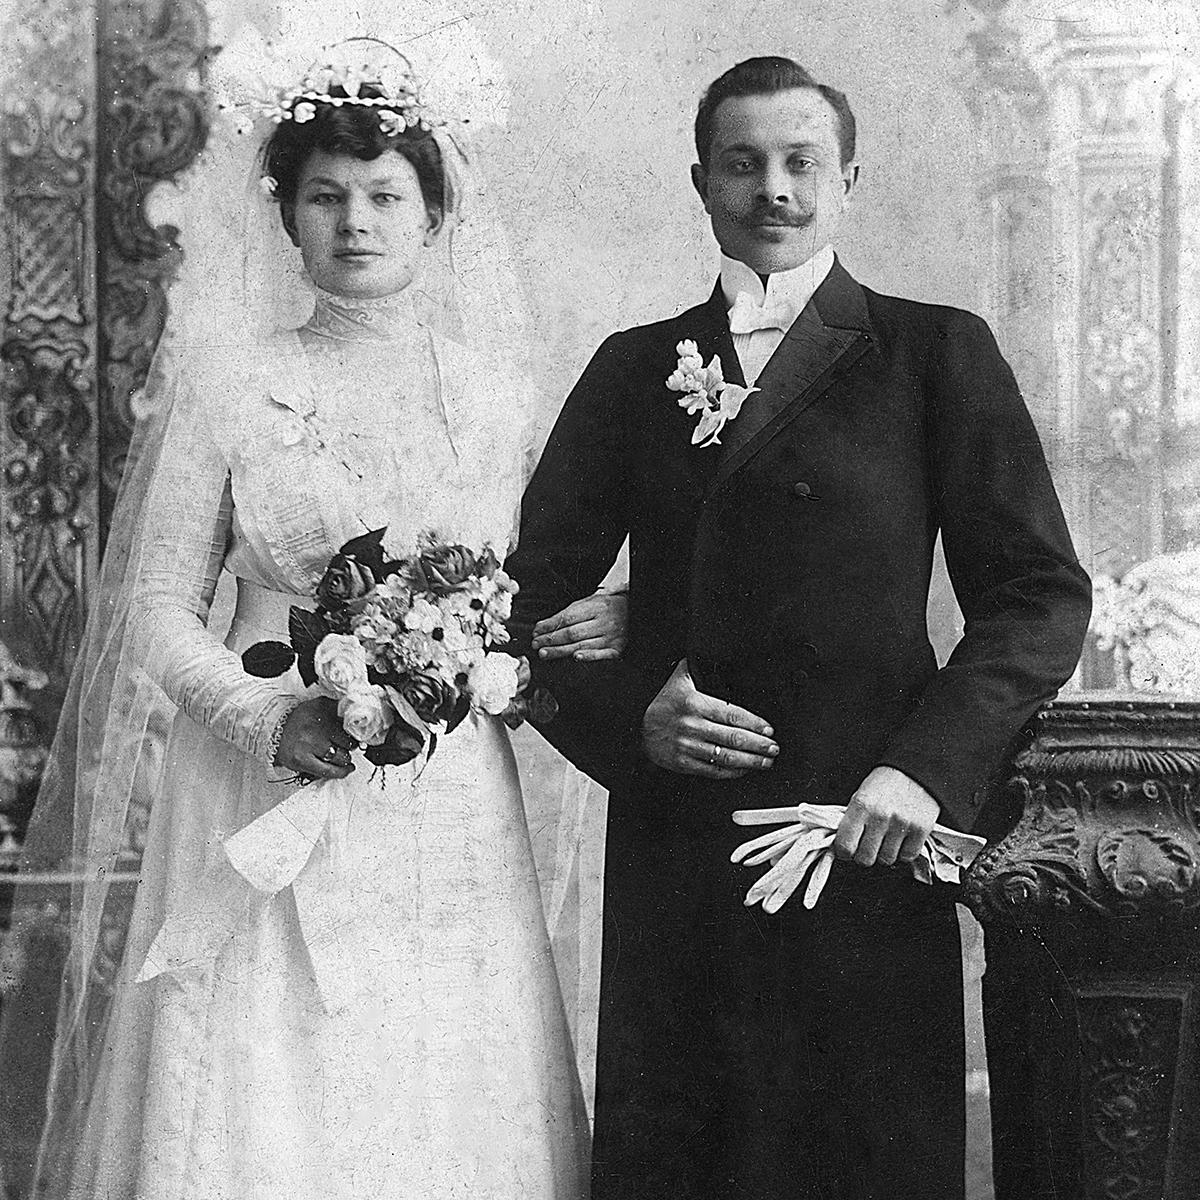 1915–1925, Sluzk, Oblast Minsk. Aus dem Archiv von Dzmitry Sjarebrnikau. Alle Fotos © VEHA.by